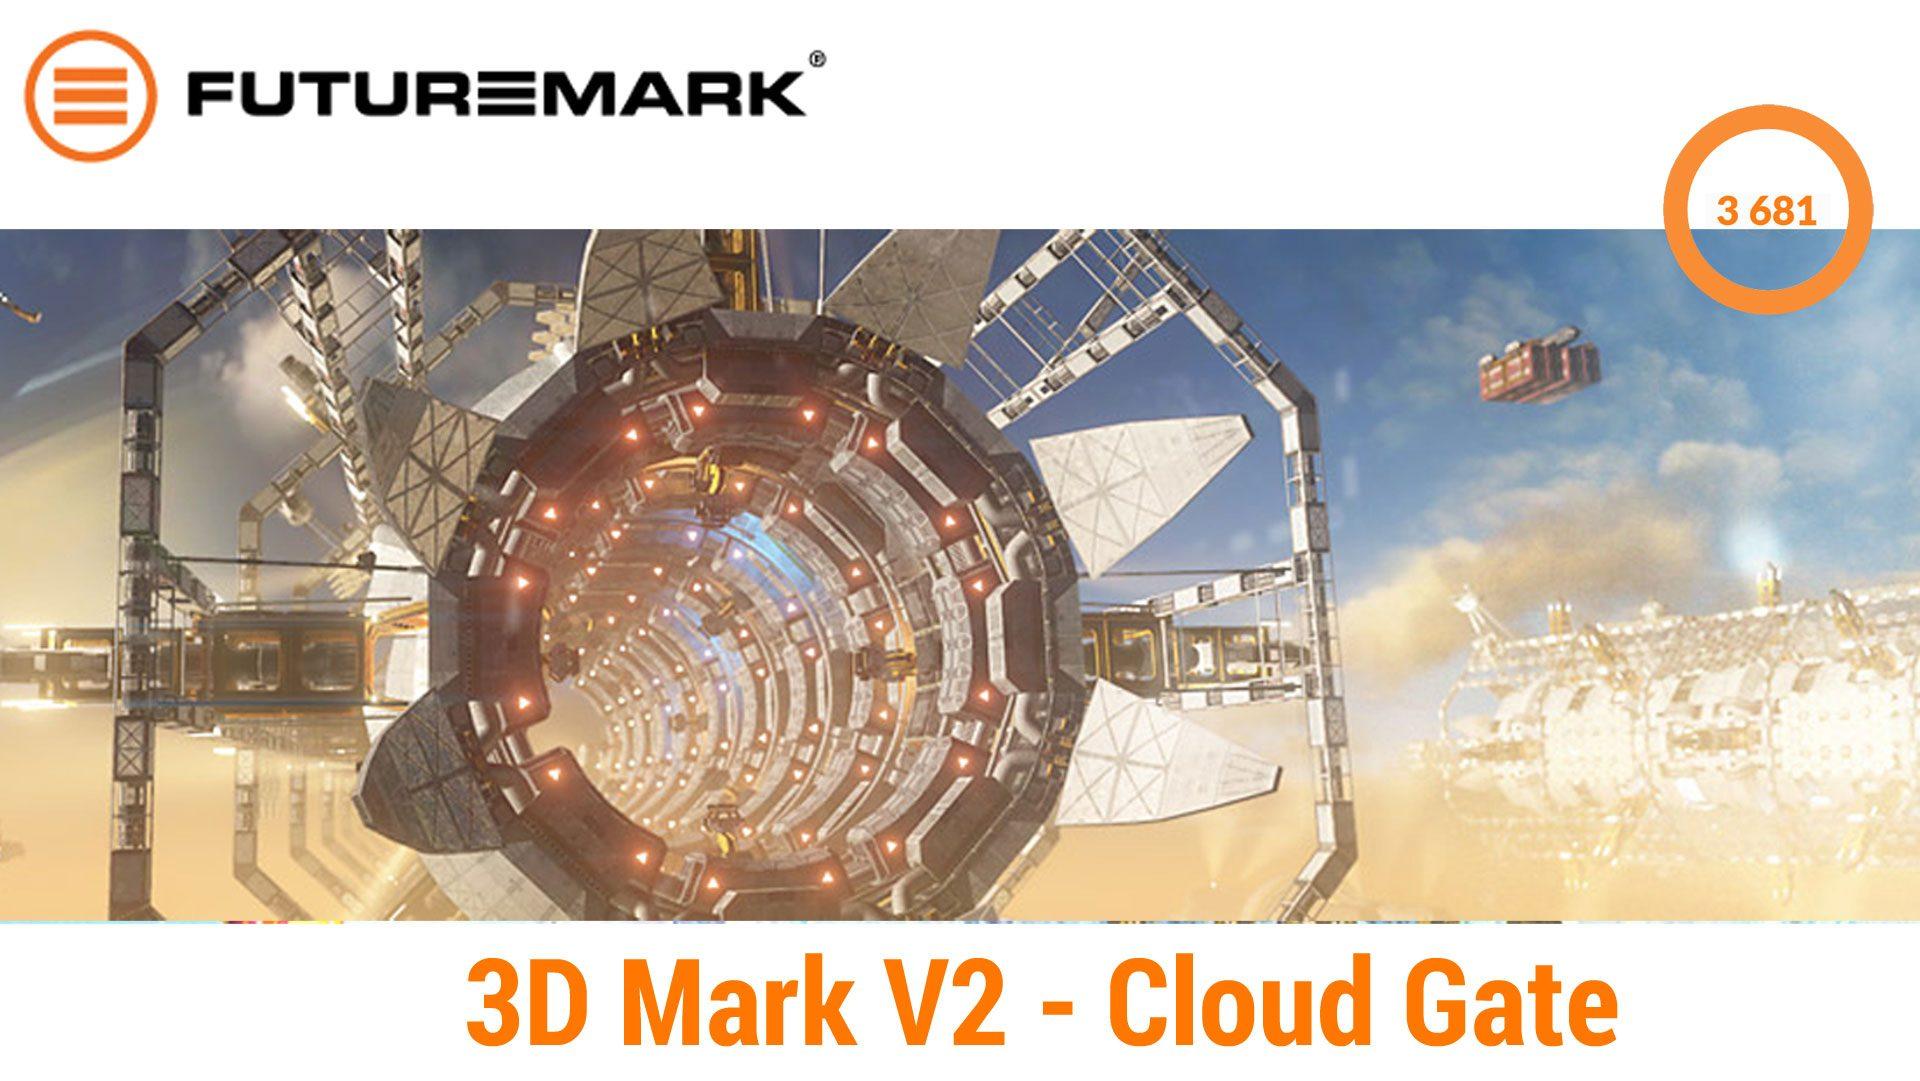 Schenker-VIA-14–M17djd_Grafik-2